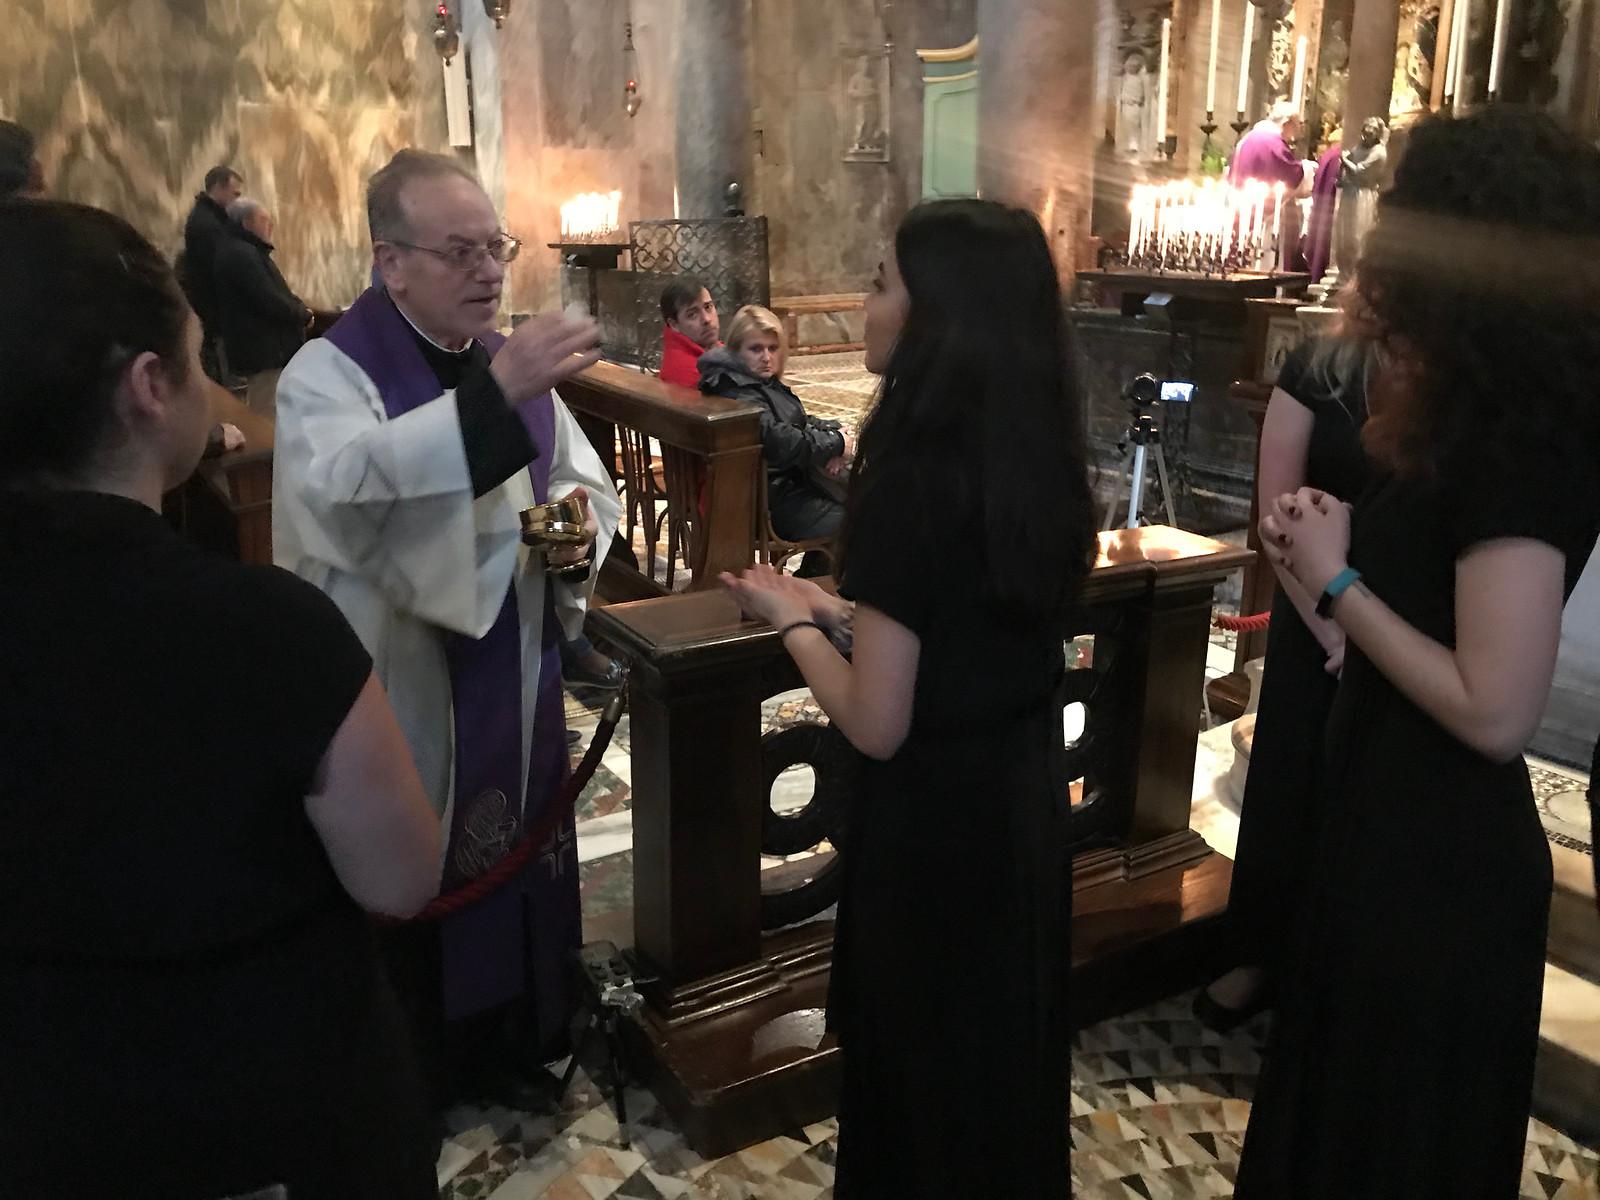 Mass in Basilica San Marco in Venice